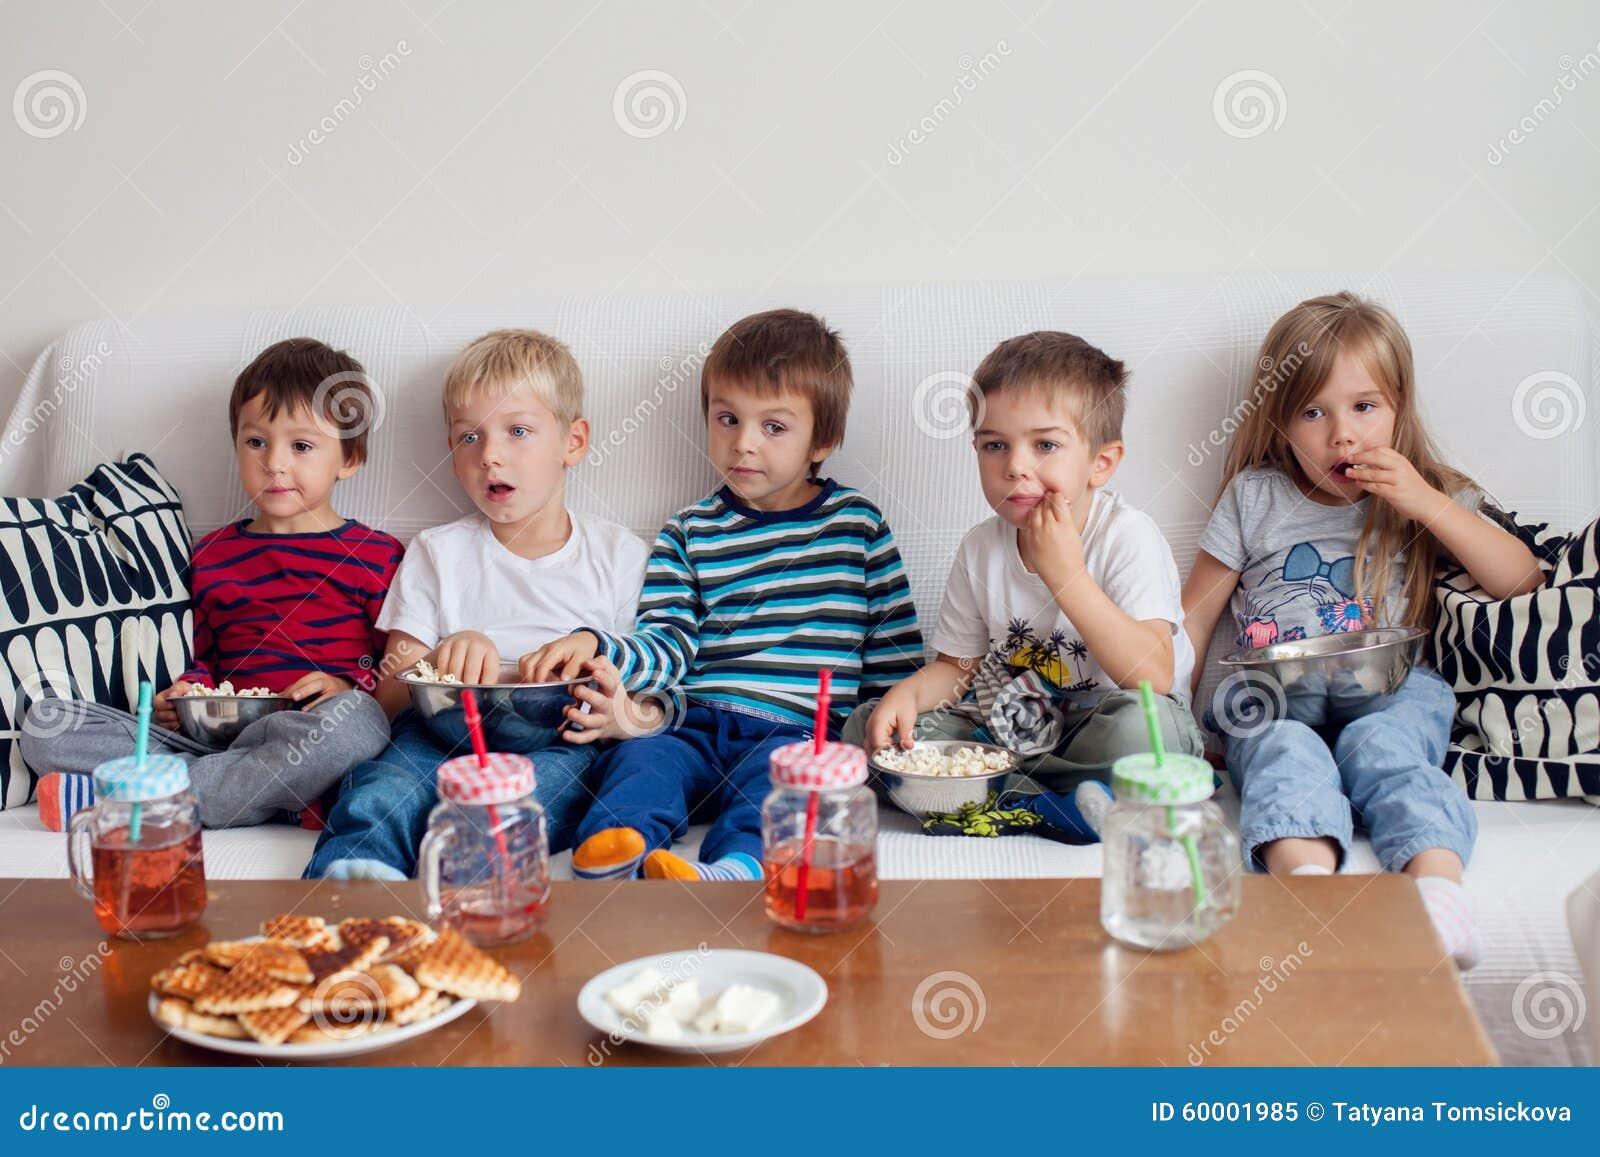 Five Sweet Kids, Friends, Sitting In Living Room, Watching ...